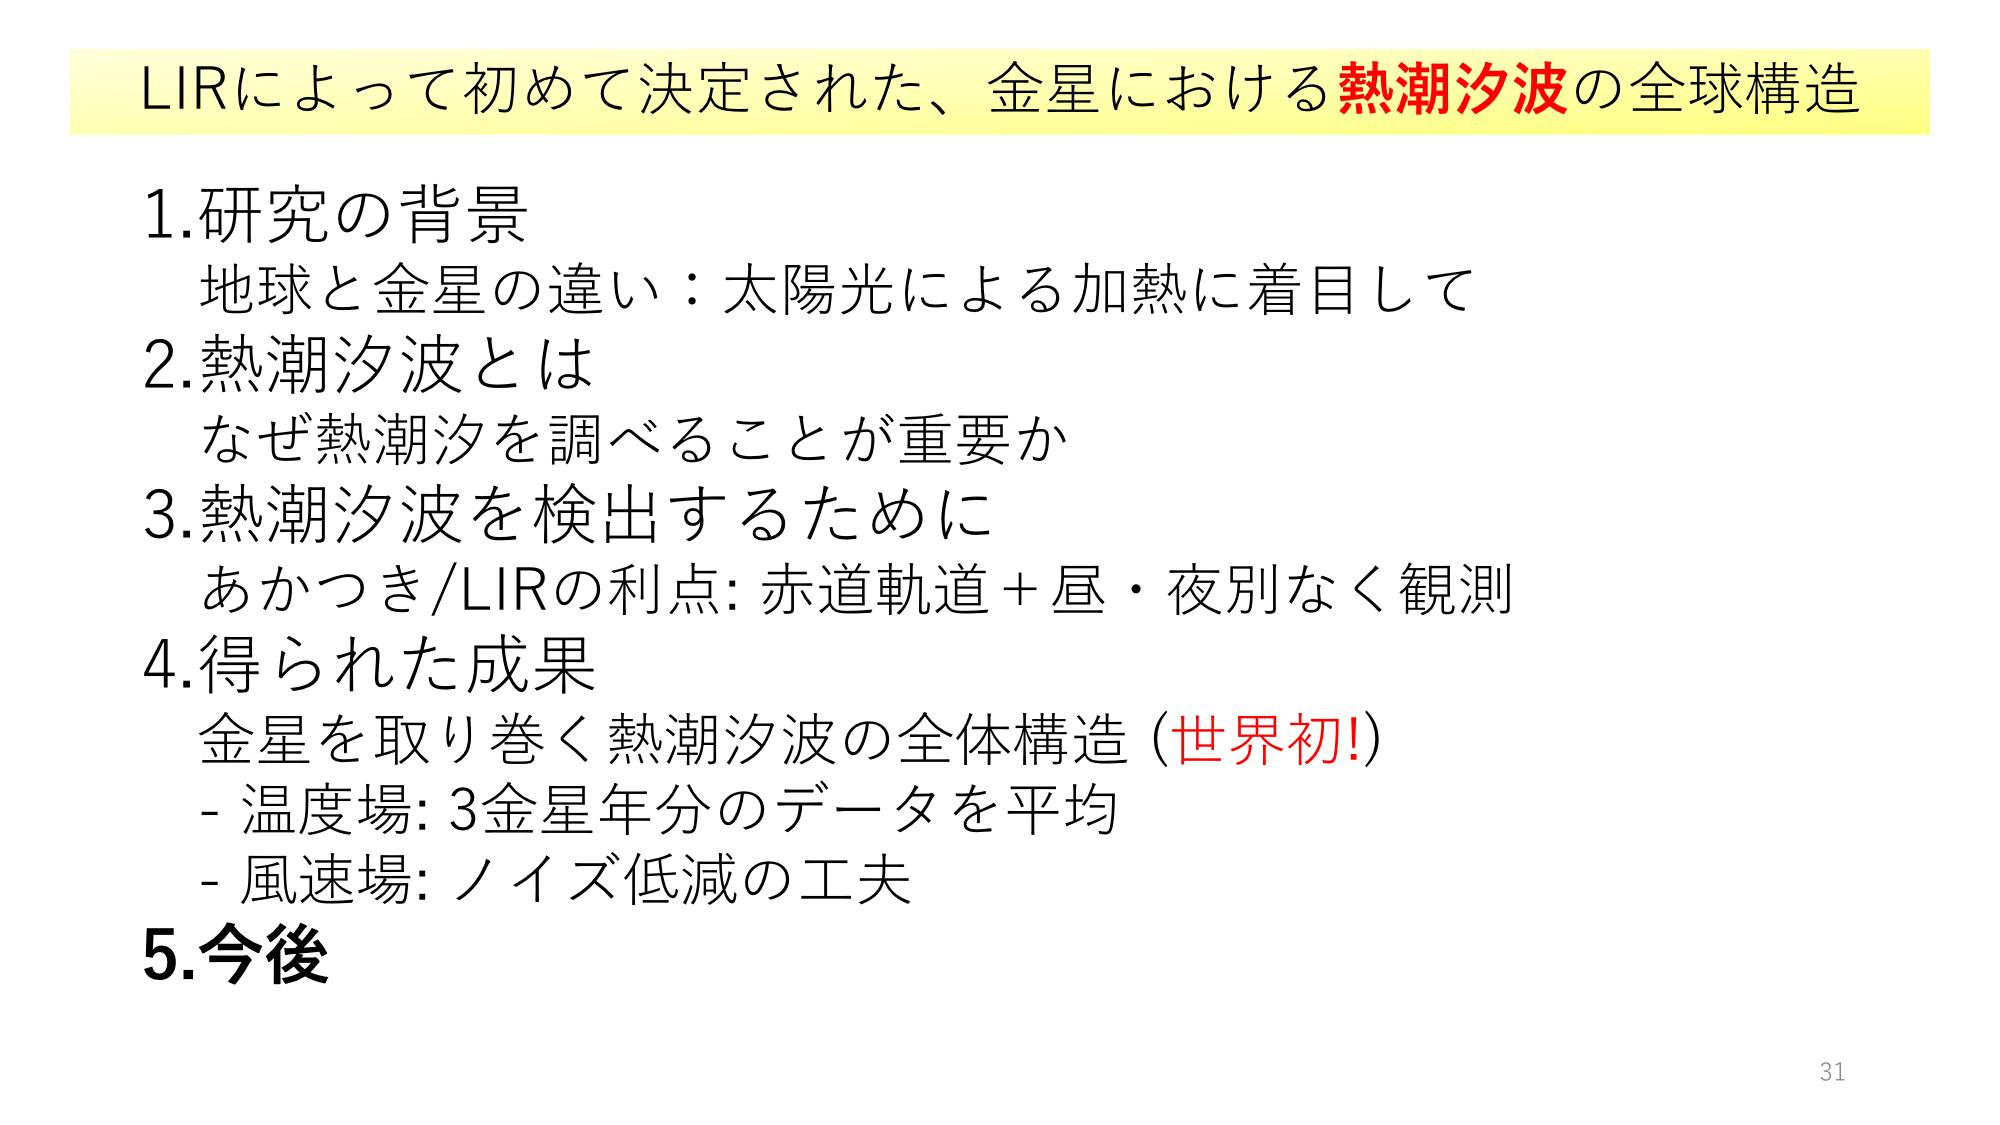 f:id:Imamura:20191119205654p:plain